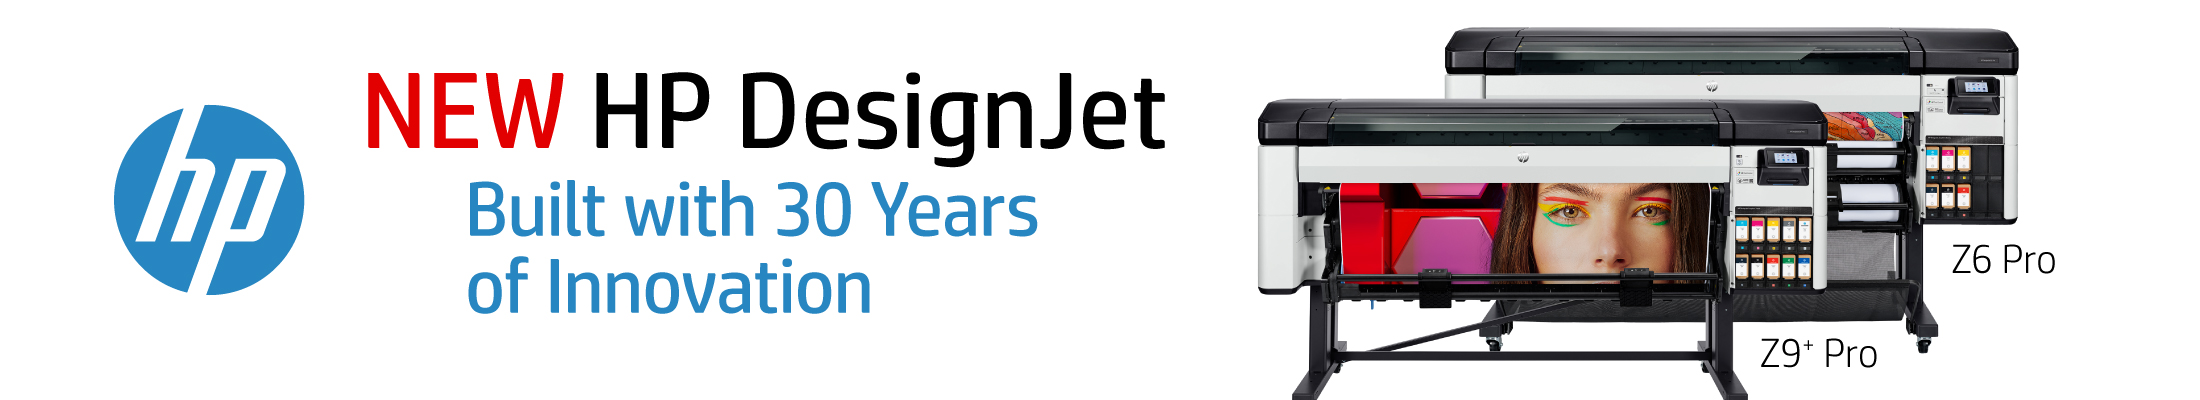 DesignJet_Z_Launch 10-13-21_01_Landpg_2200x400px